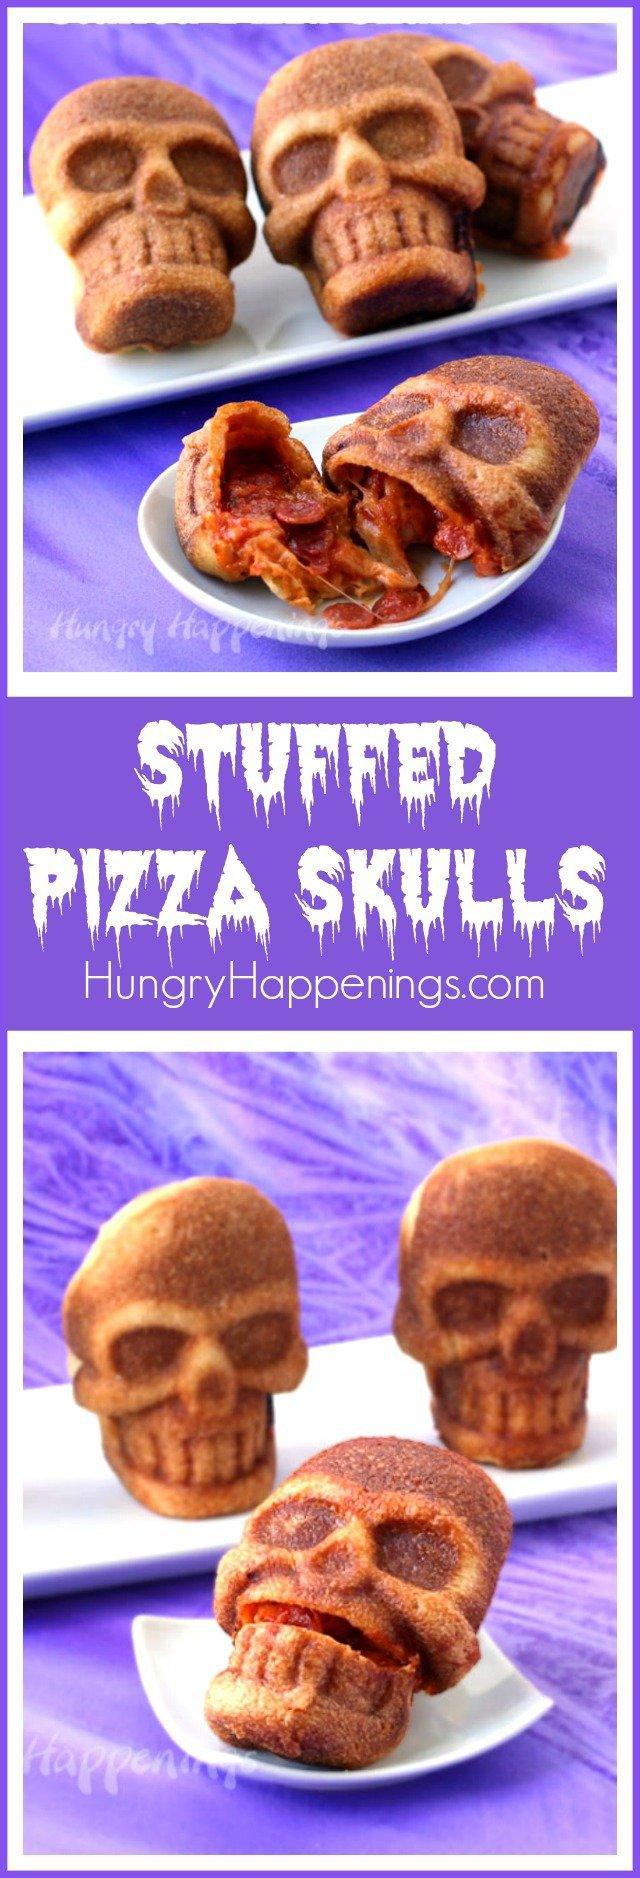 How to Make Stuffed Pizza Skulls